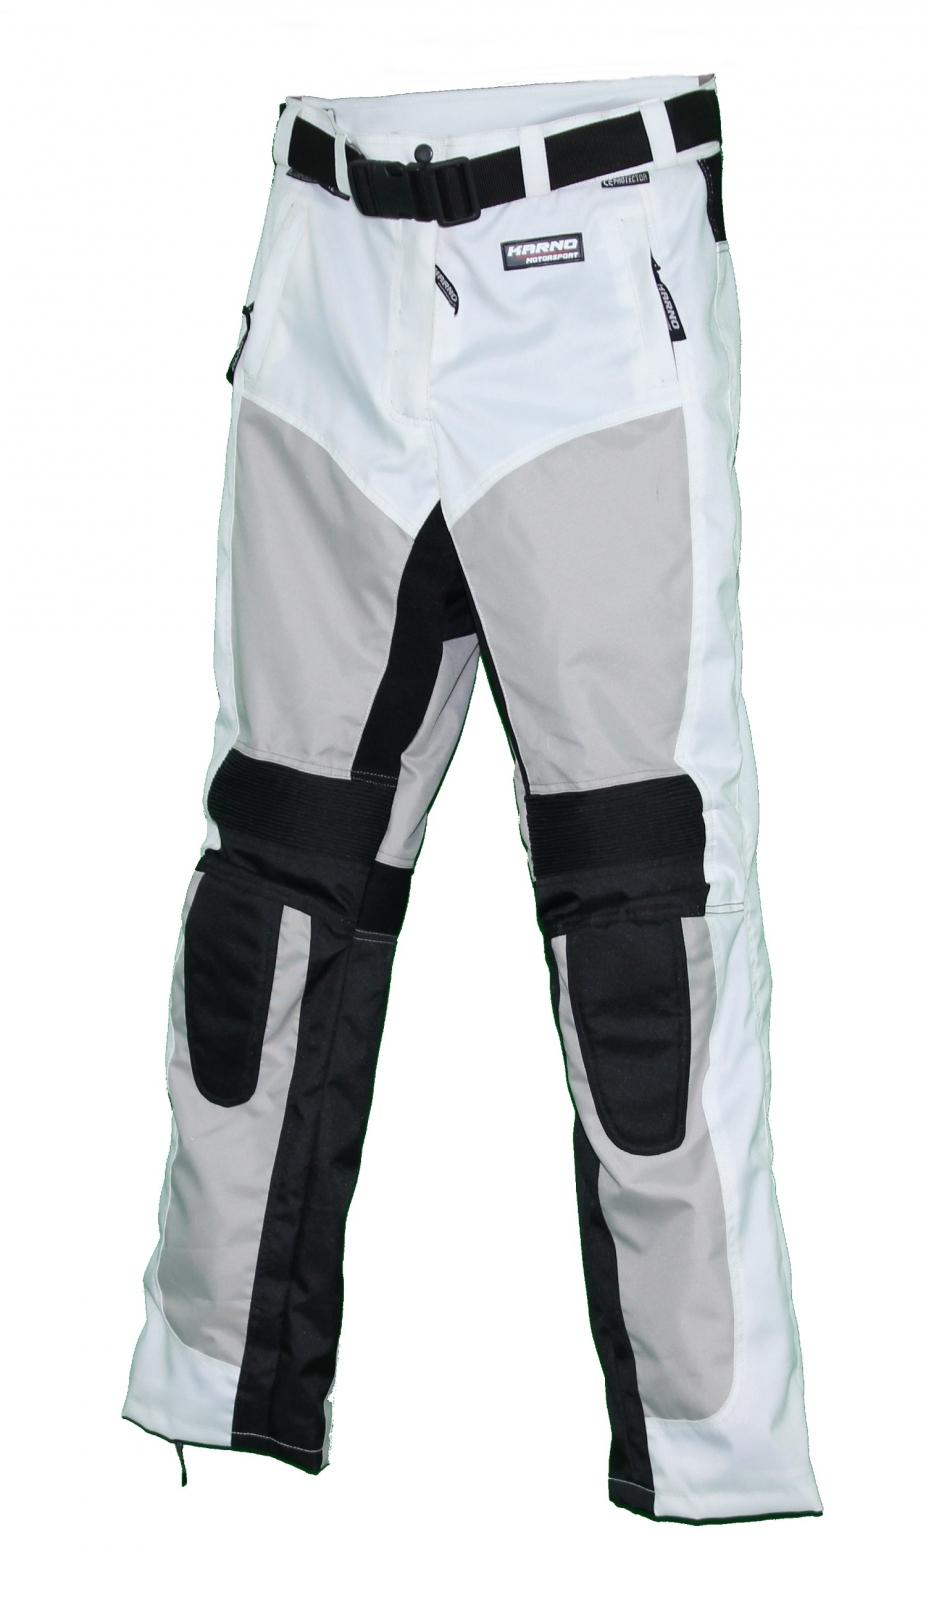 kt304 pantalon moto textile femme blanc karno white pearl pantalon pantalon moto femme. Black Bedroom Furniture Sets. Home Design Ideas